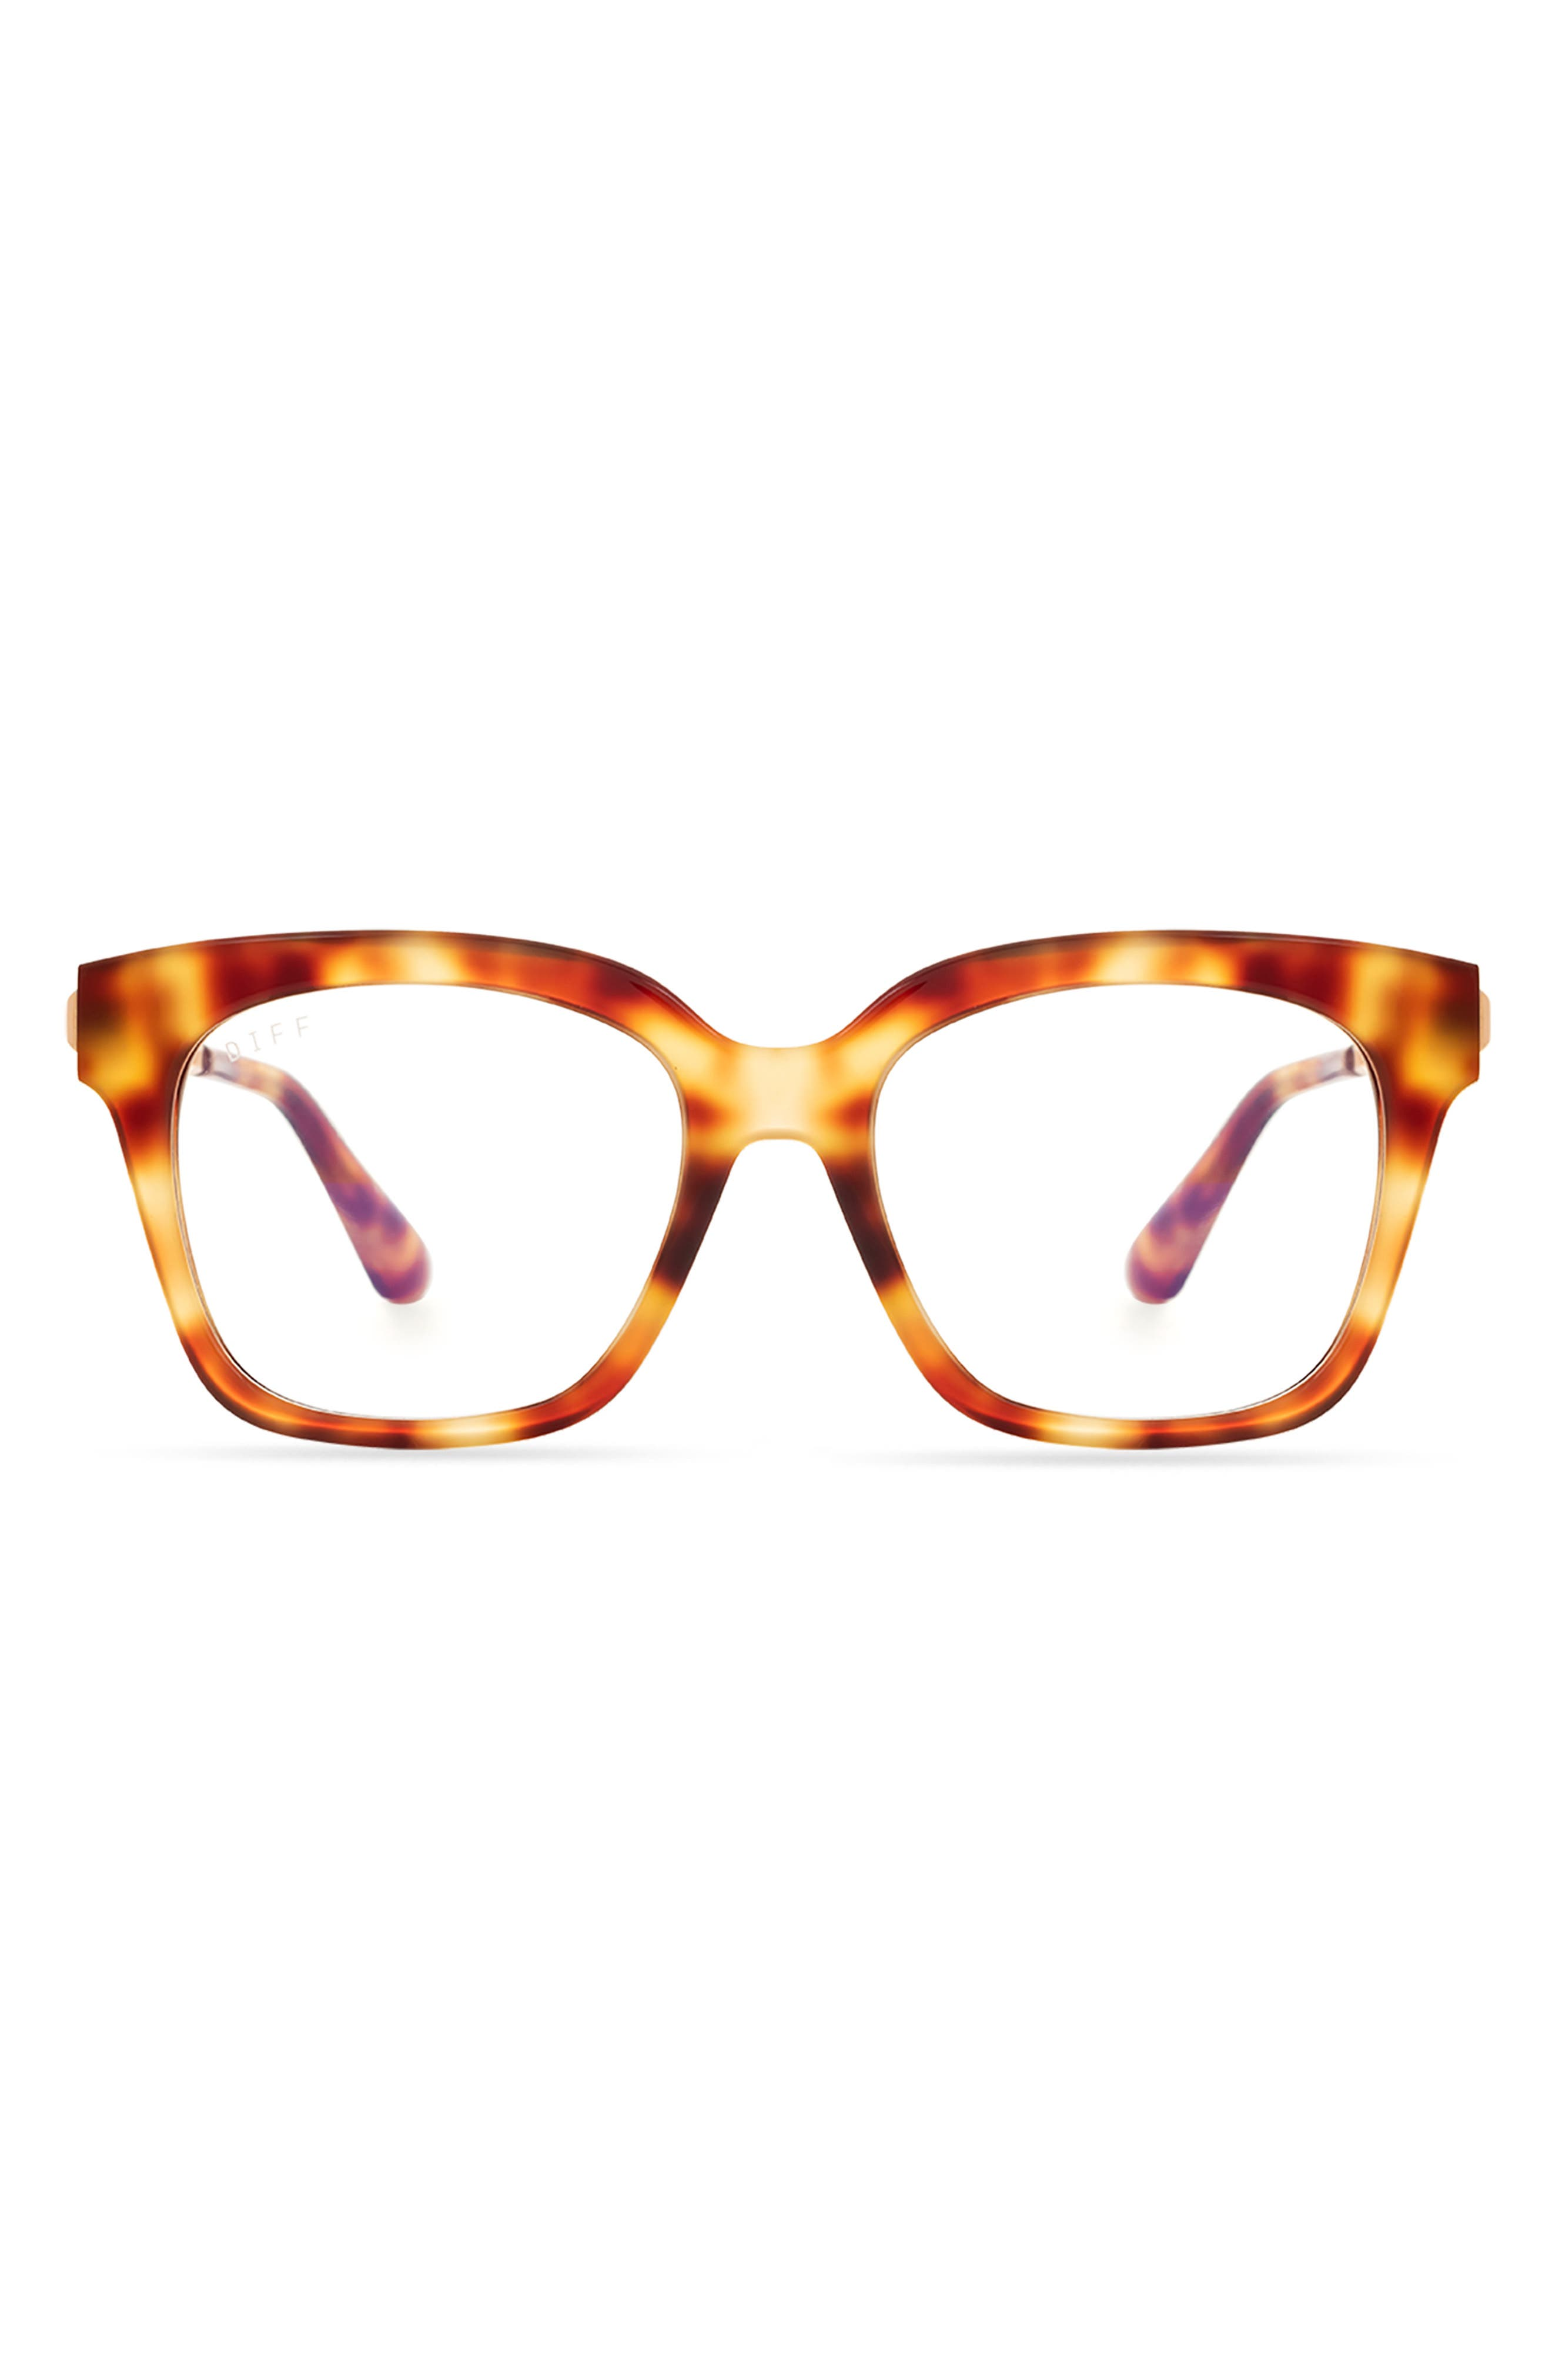 Bella Xs 50mm Blue Light Filtering Glasses